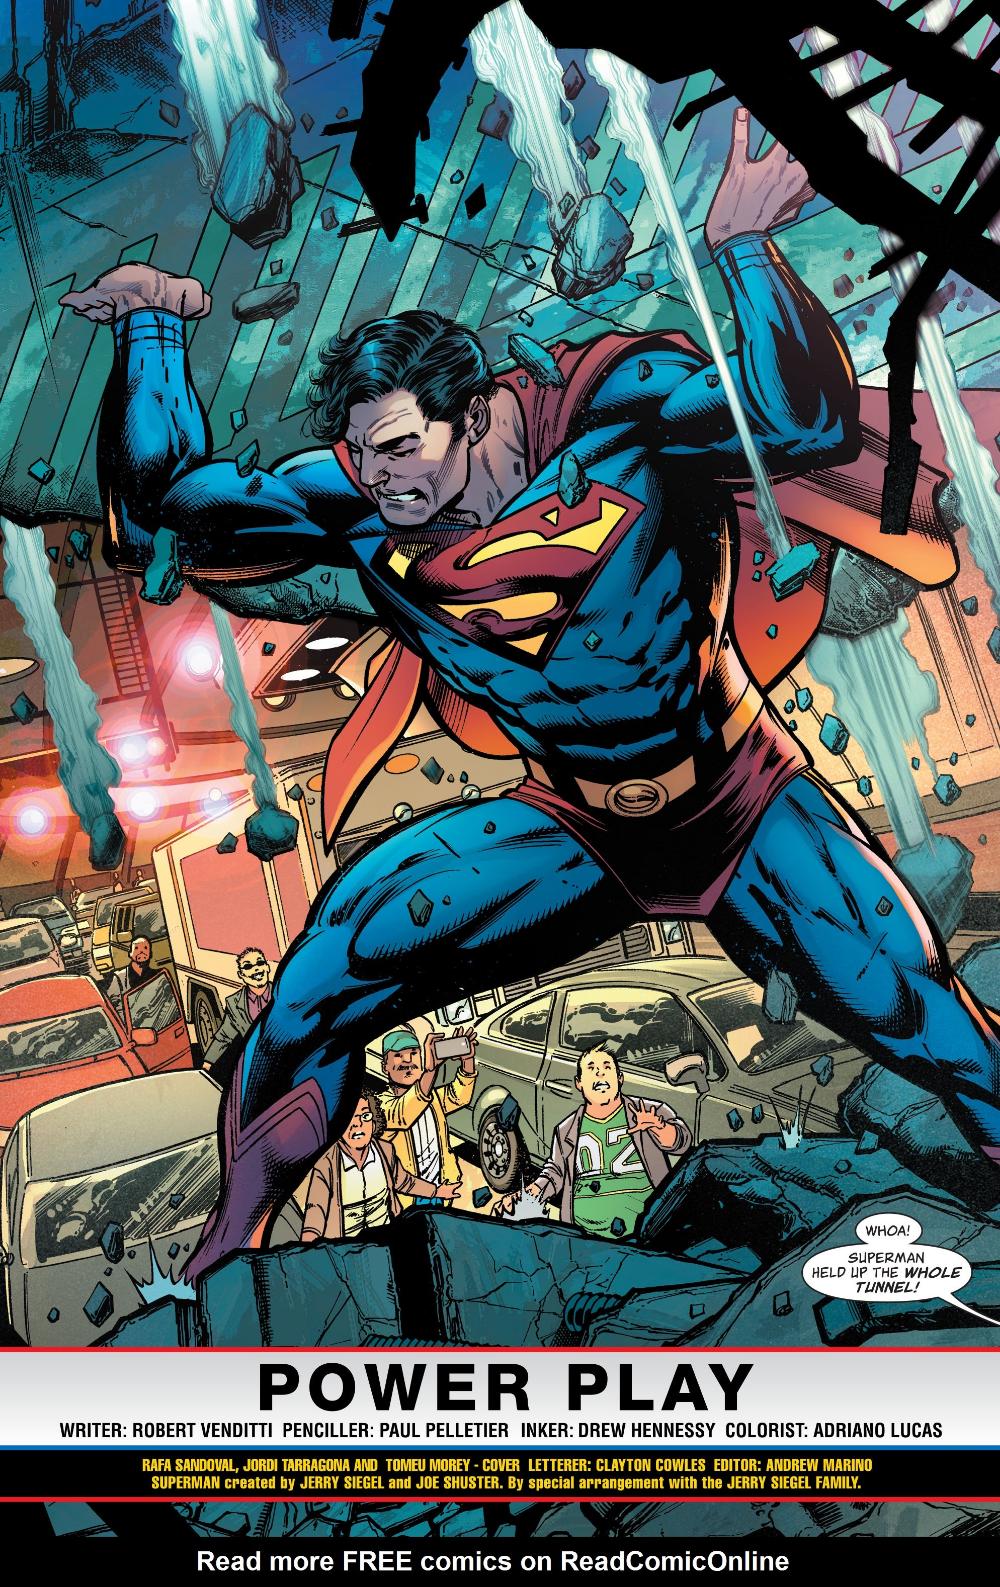 Read Superman Man Of Tomorrow Issue 1 Online Comicpunch Net Superman Artwork Superman Art Comic Books Art